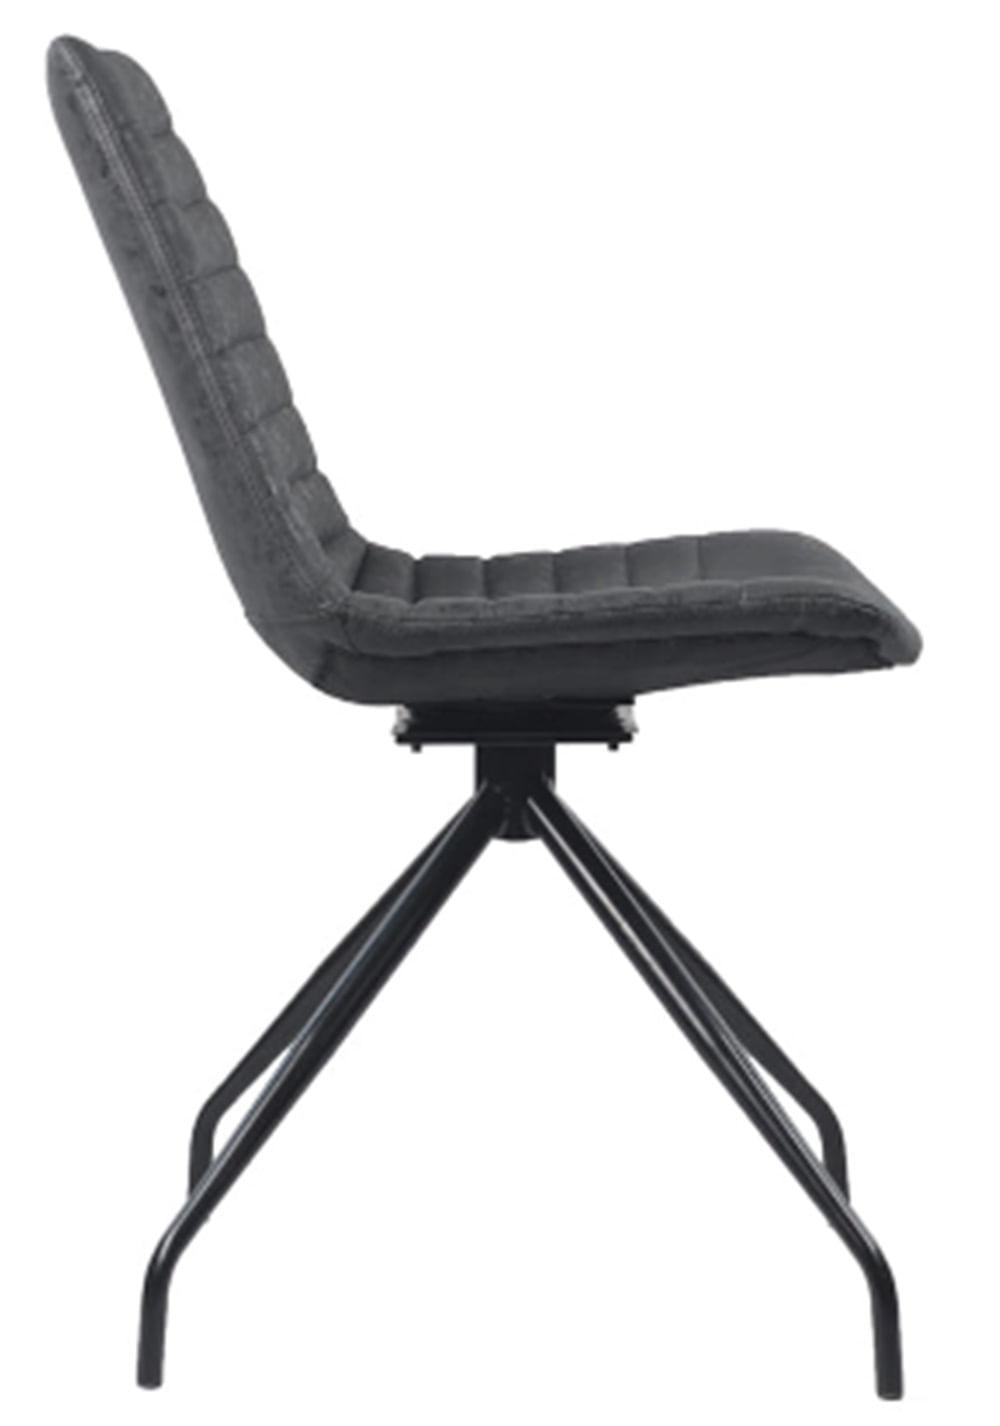 Cadeira Dini Corino Preta com Base Giratoria Preta - 58176